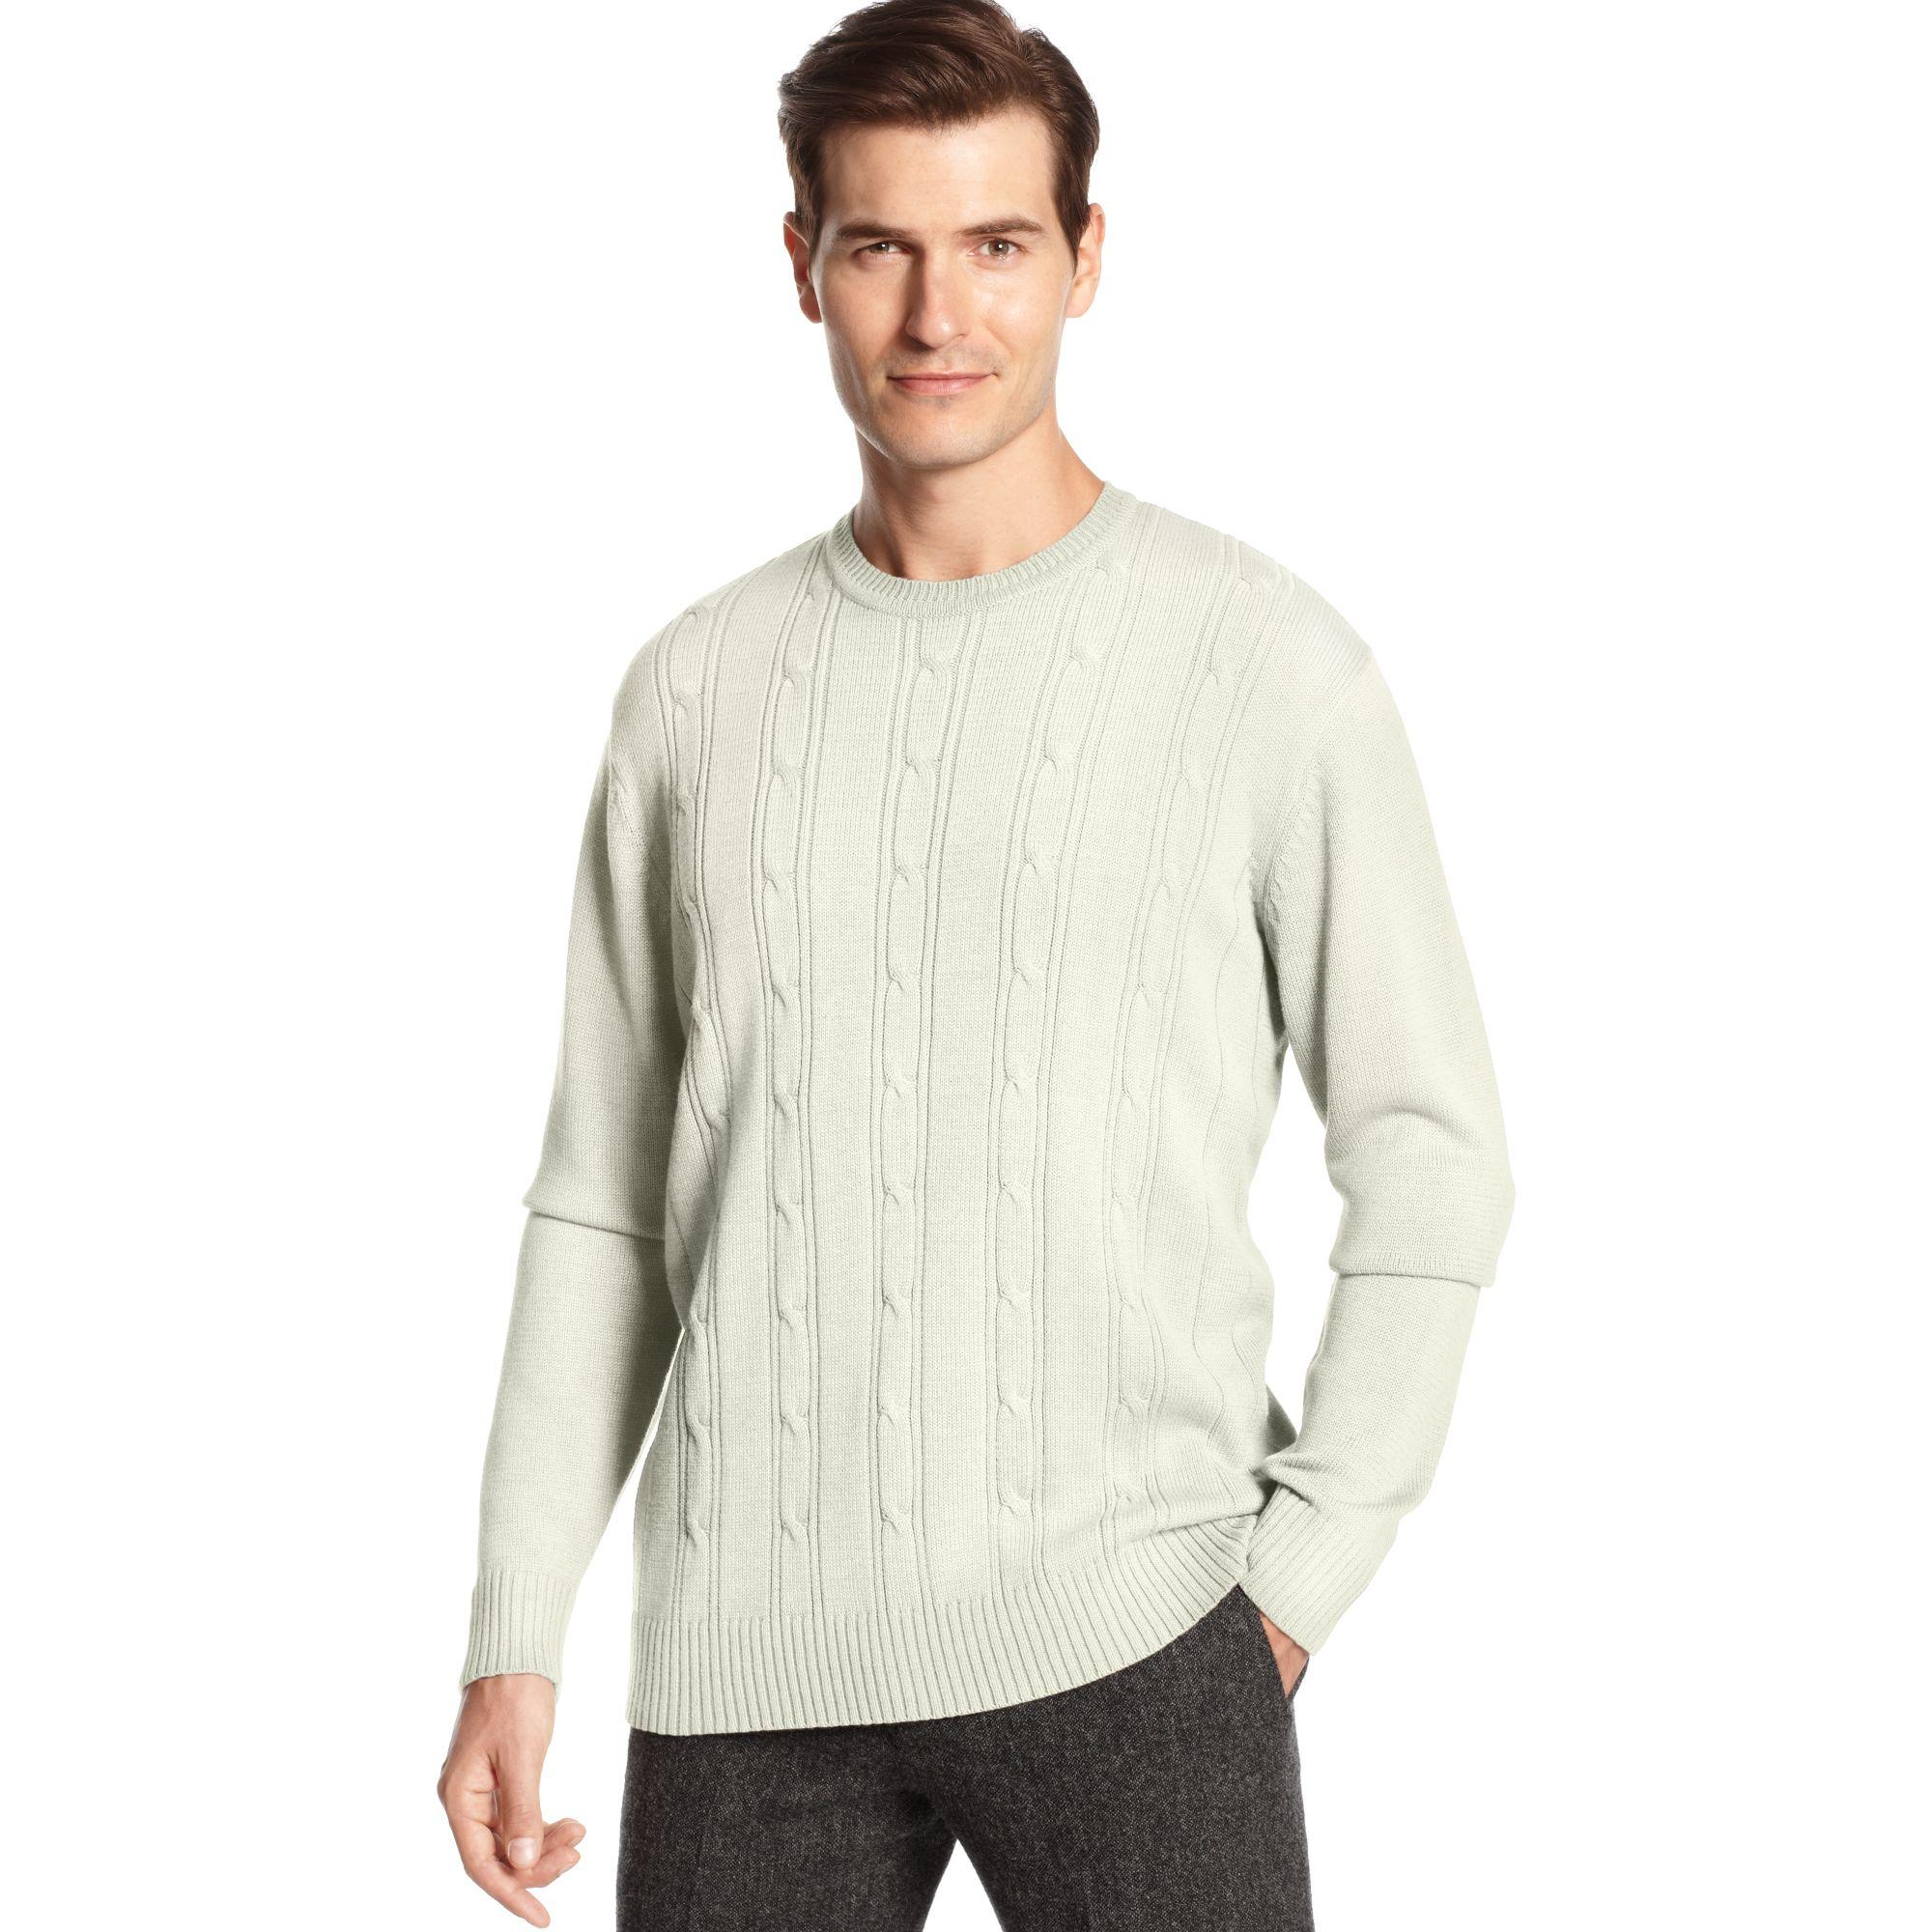 Lyst Oscar De La Renta Crew Neck Cotton Cable Sweater In Natural